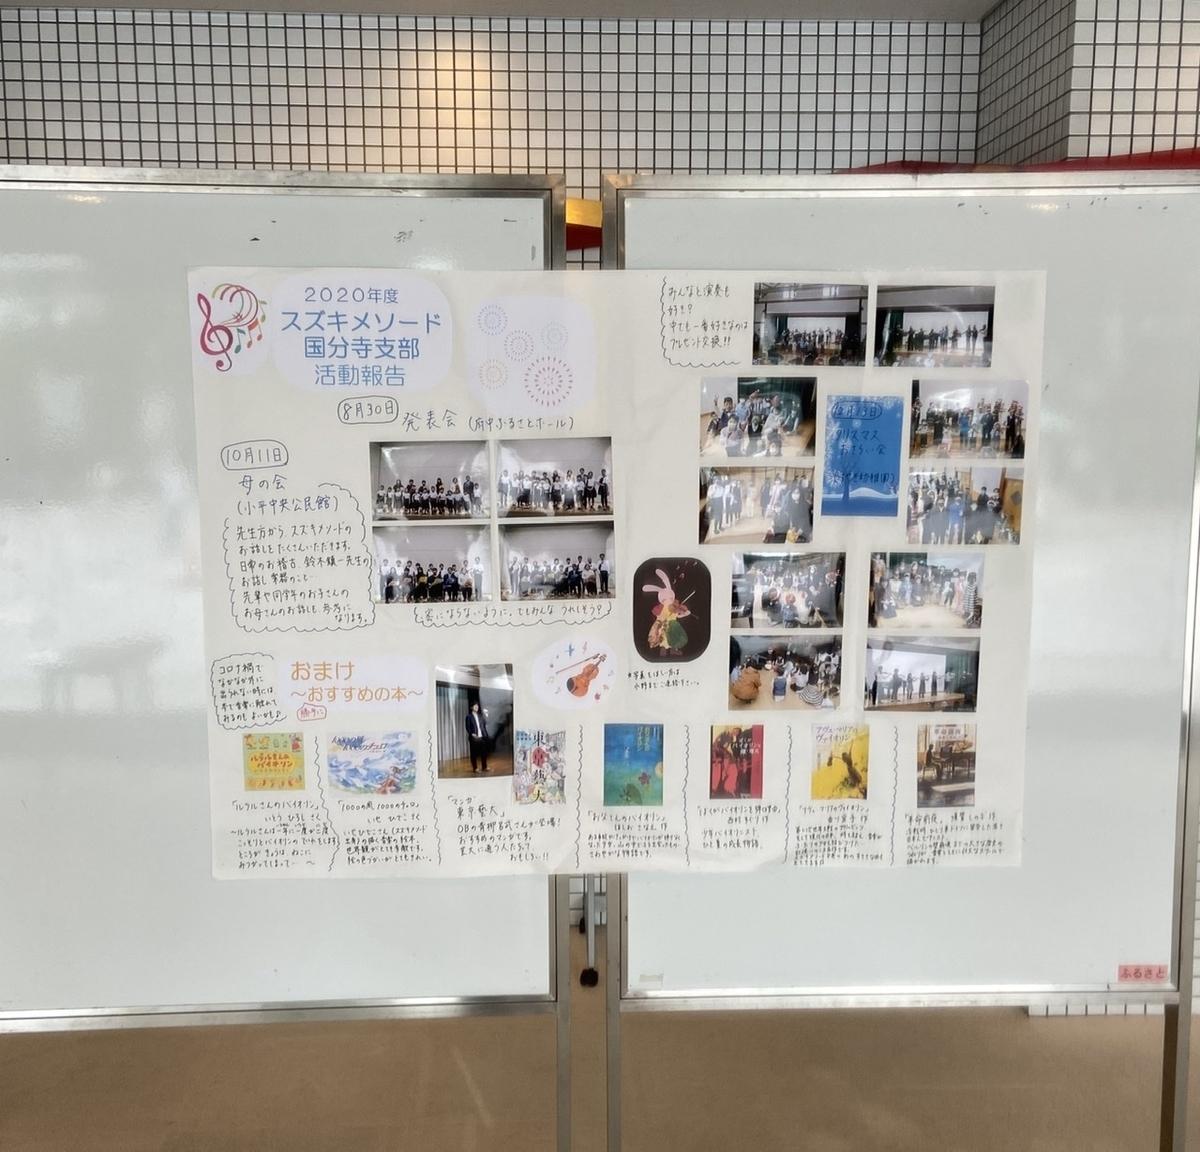 f:id:suzukimethod-kokubunjishibu:20210629134029j:plain